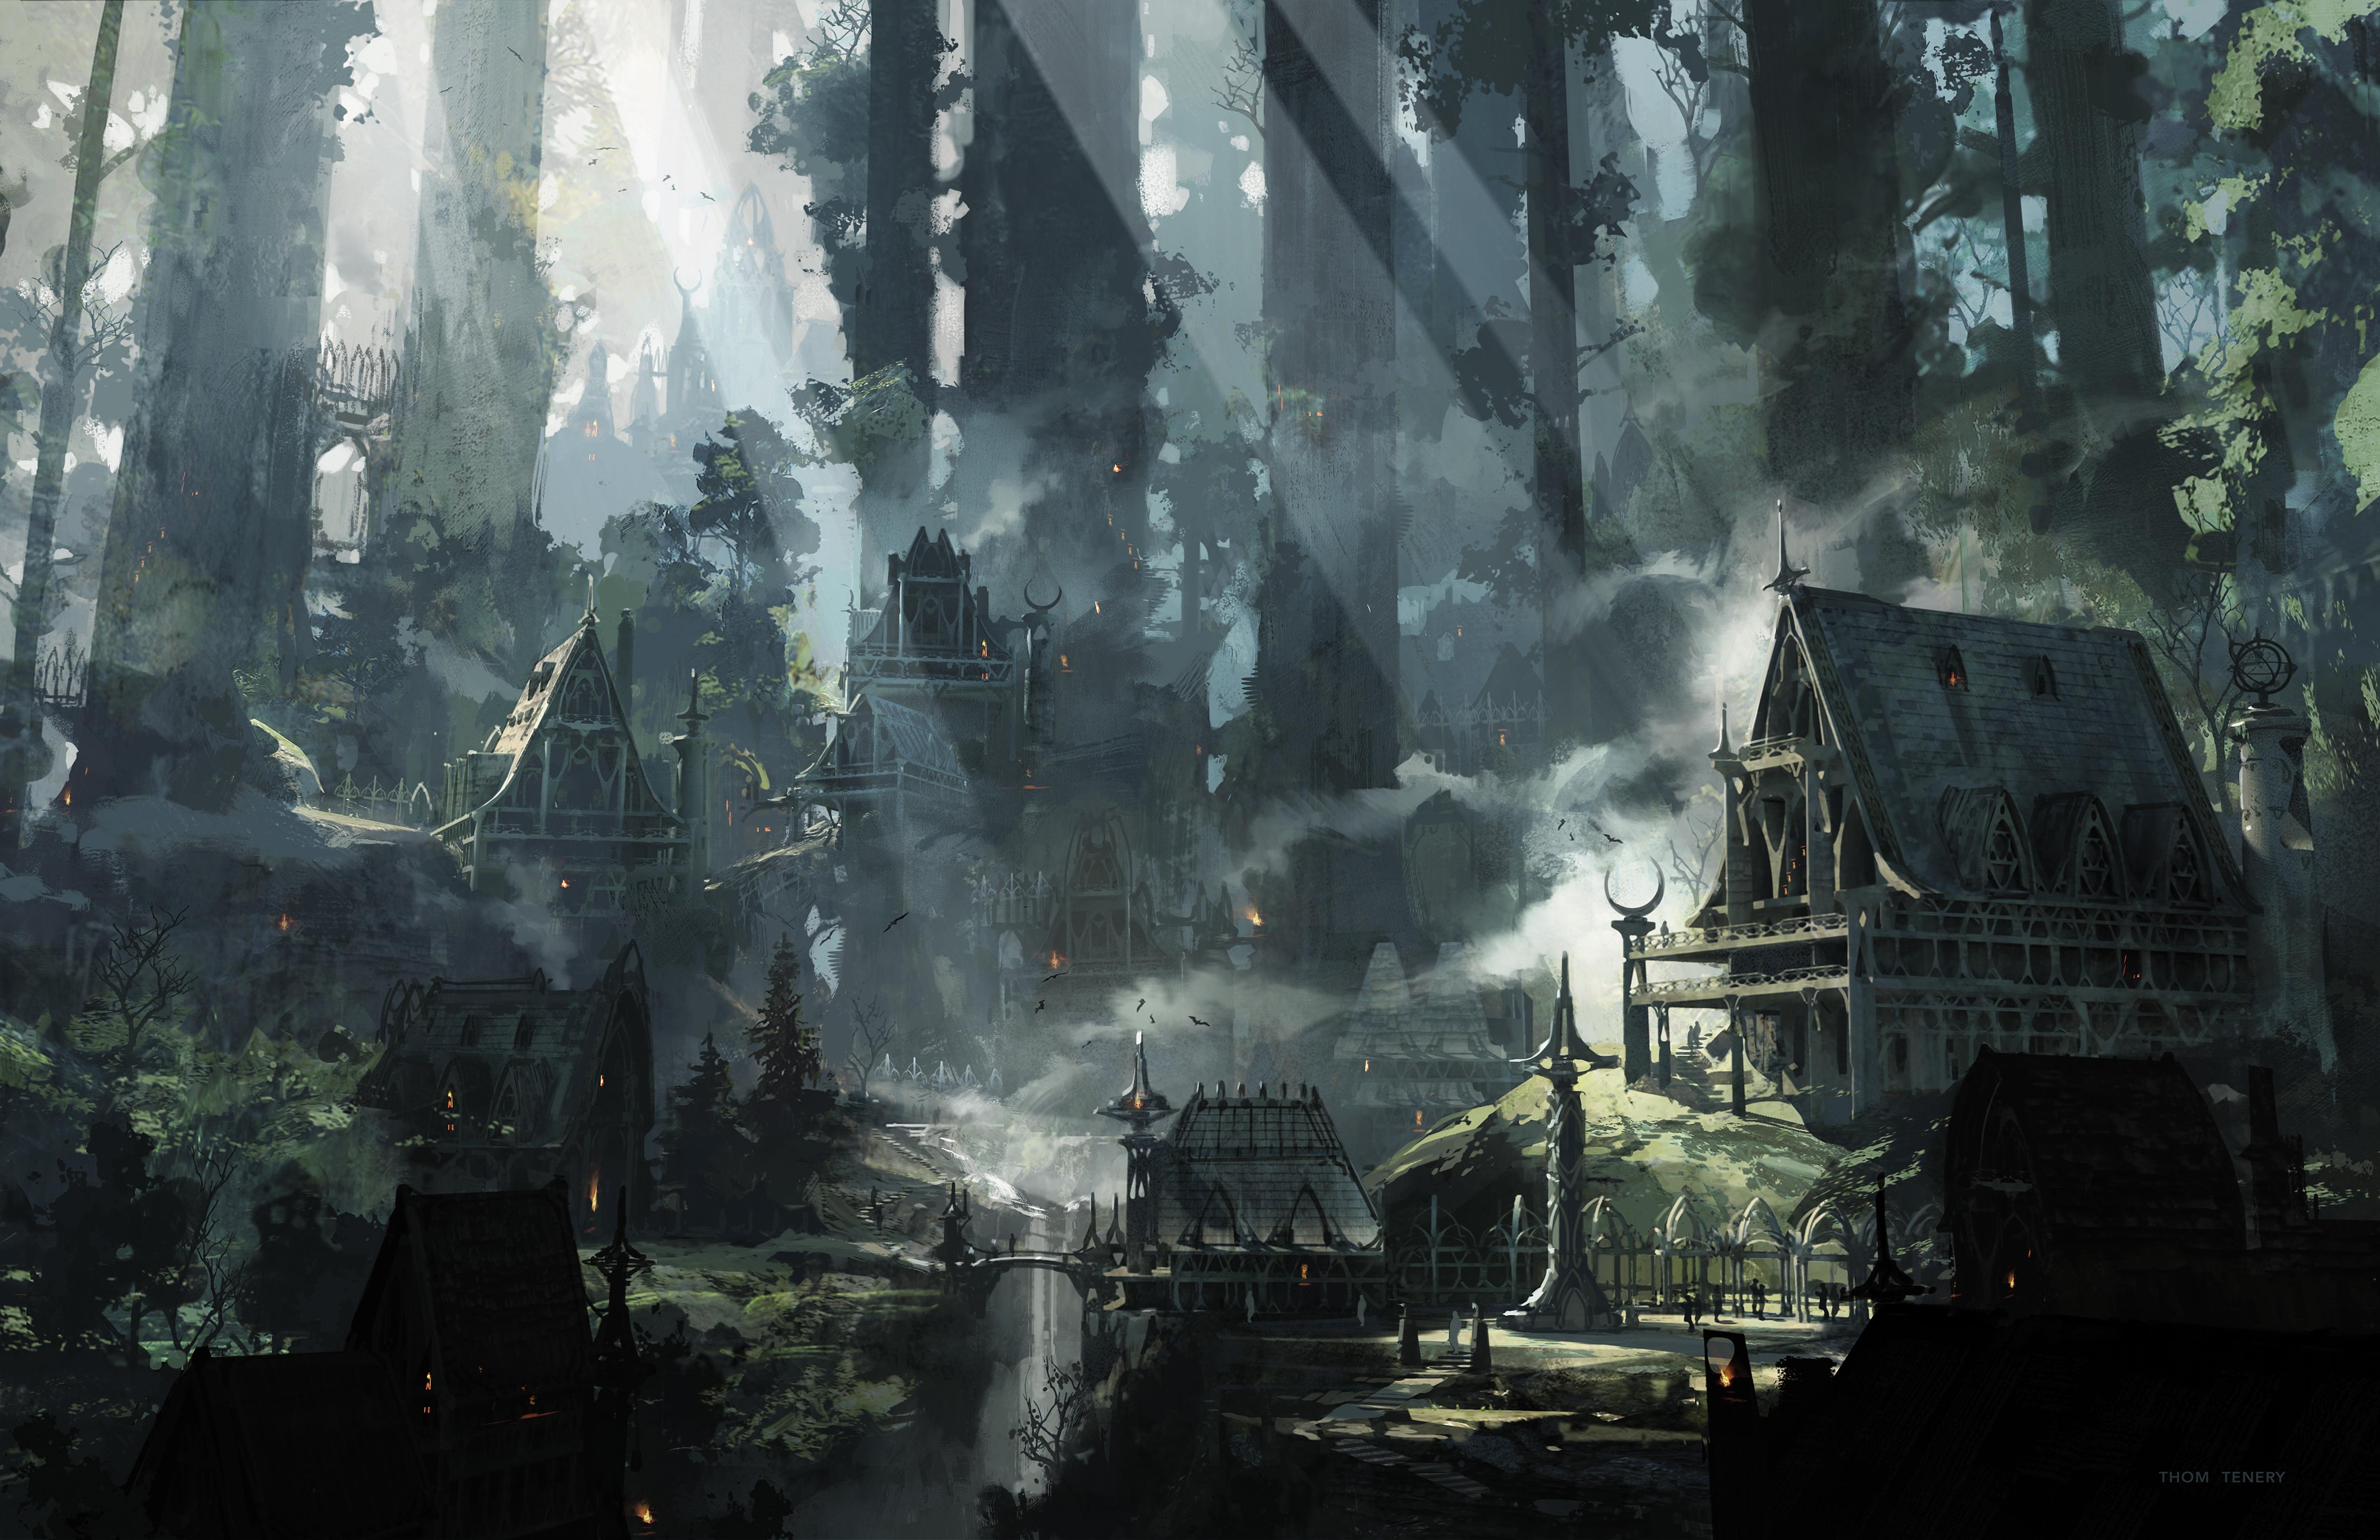 Elven_City_-_Players_Handbook_jpg_jpgcopy